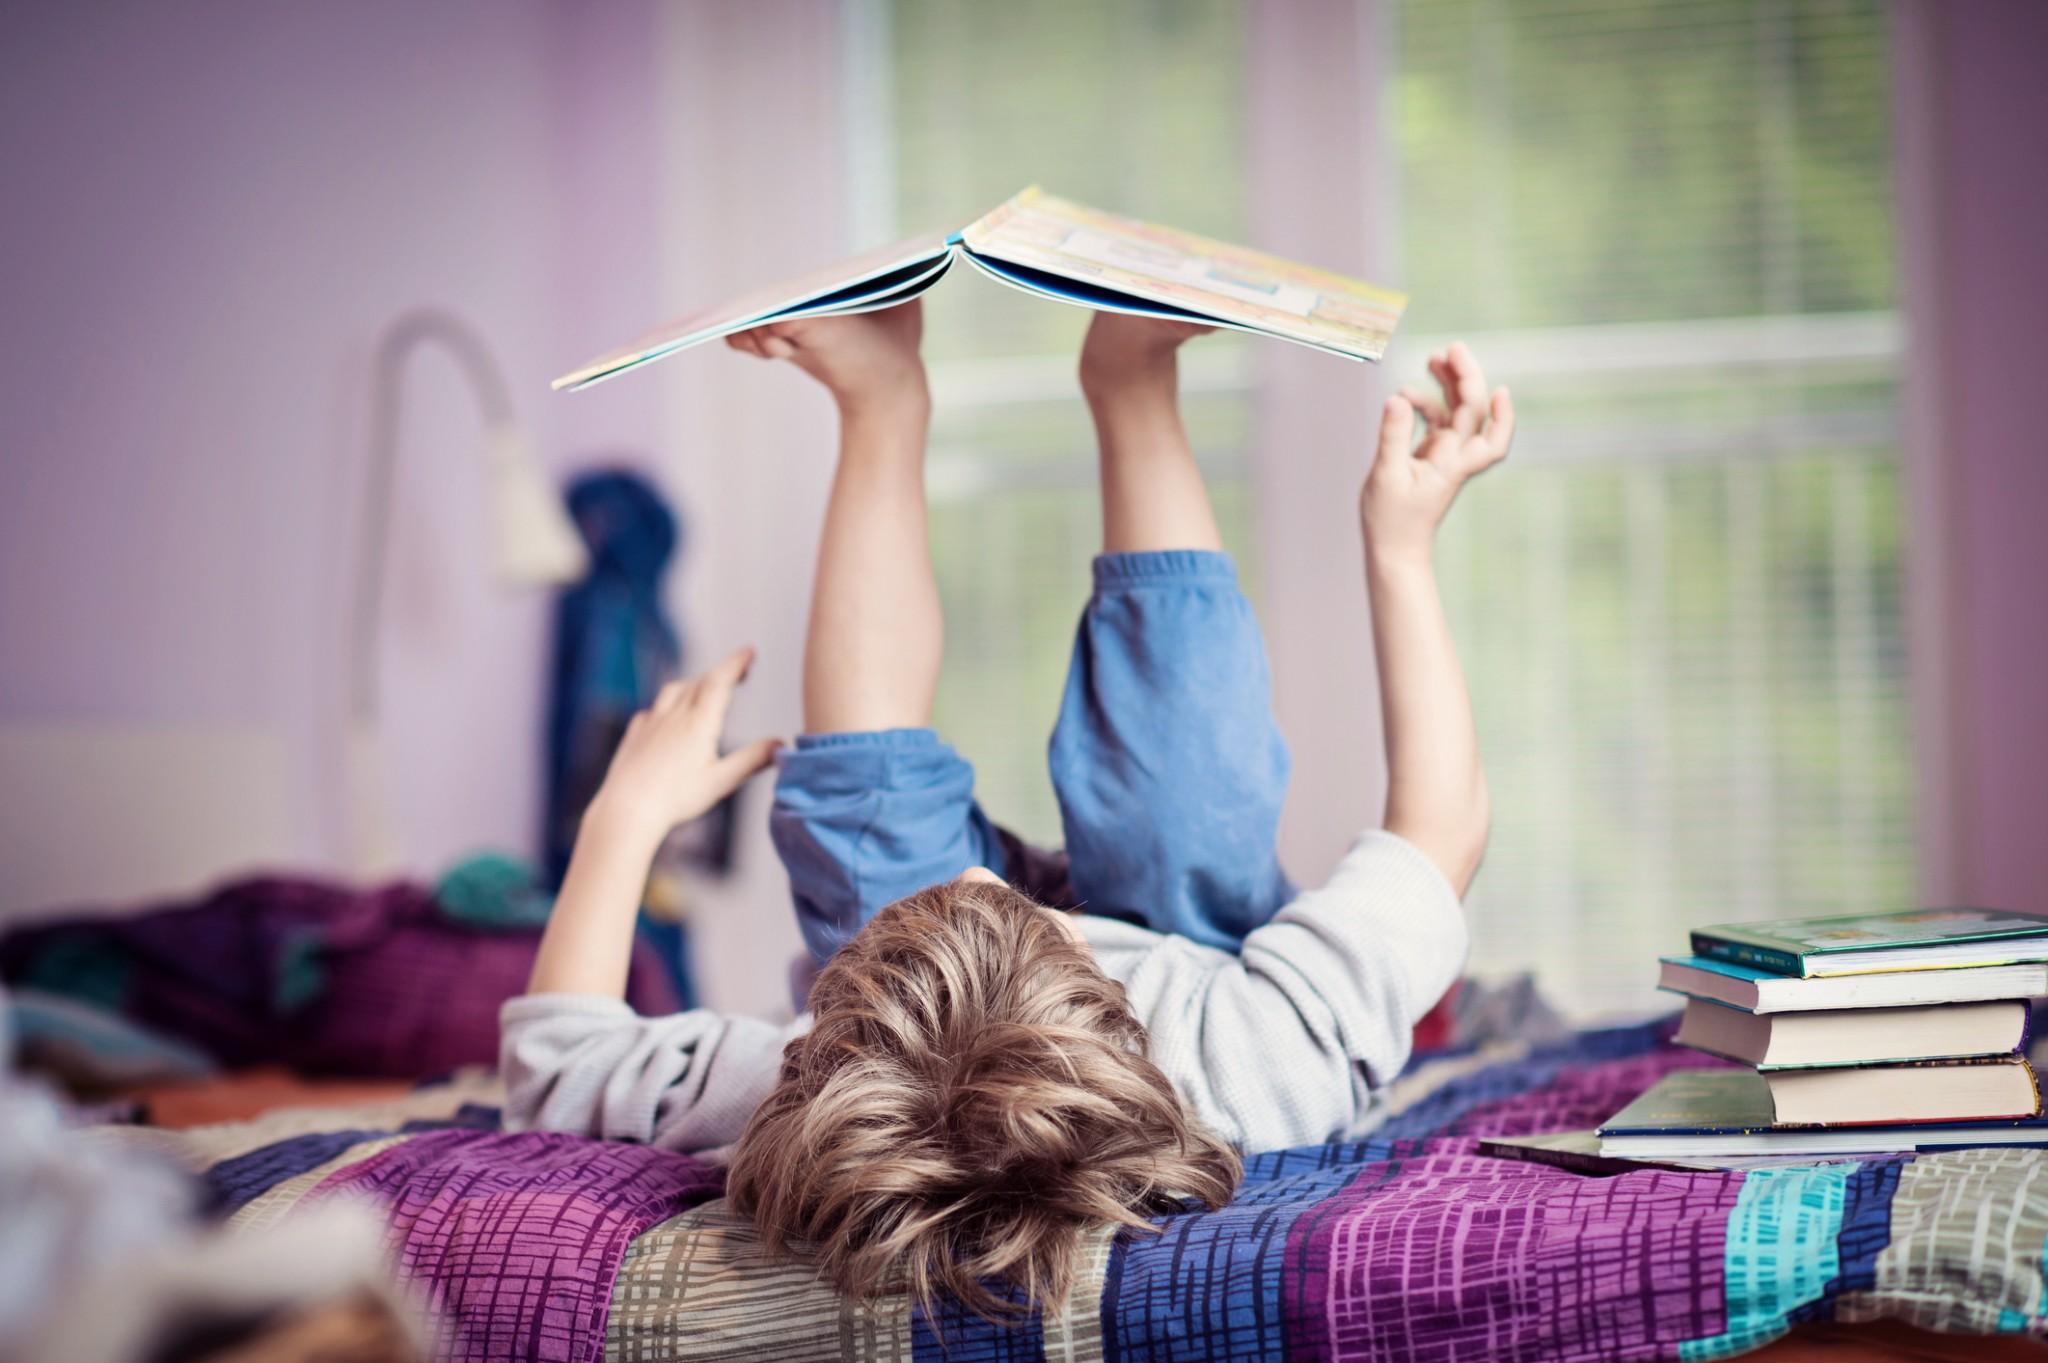 Boy reading Children's Books, Education Closet